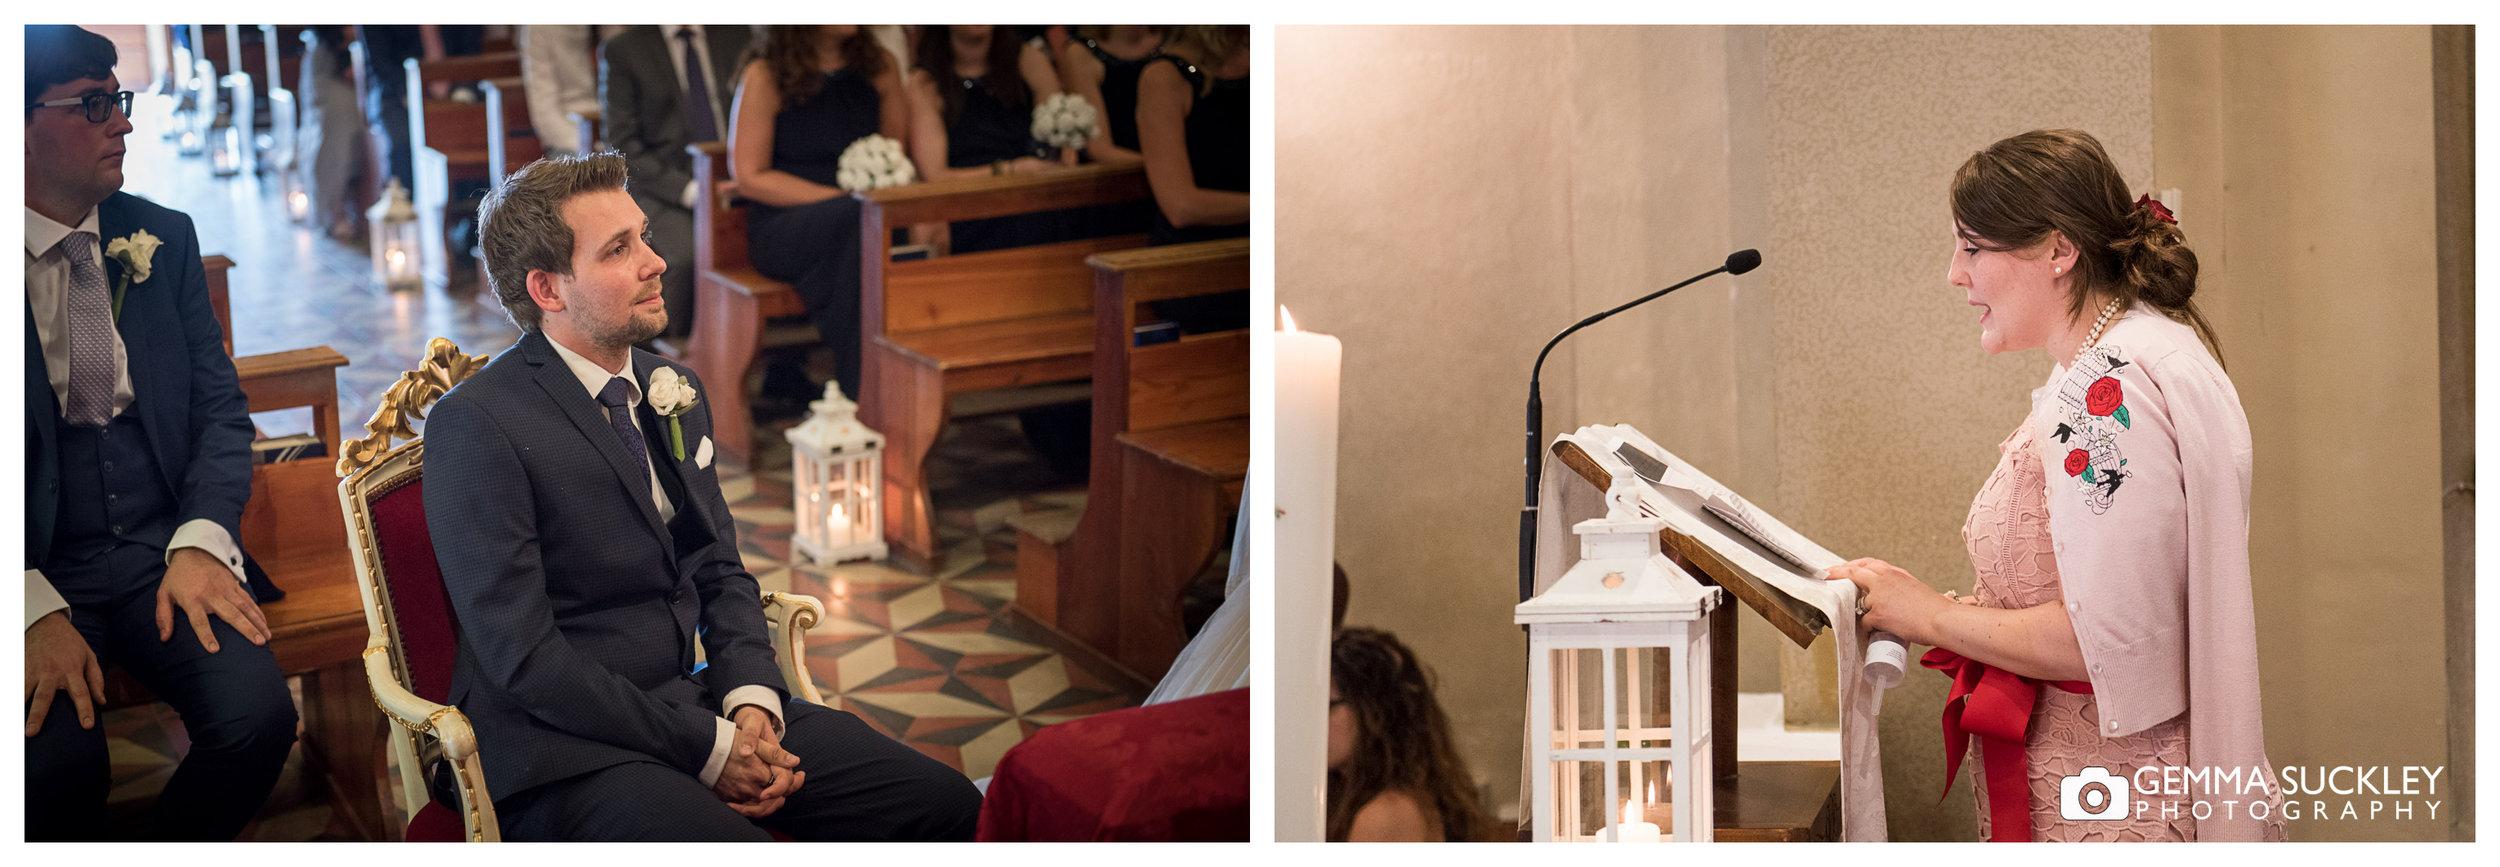 wedding reading in Lake Garda Church